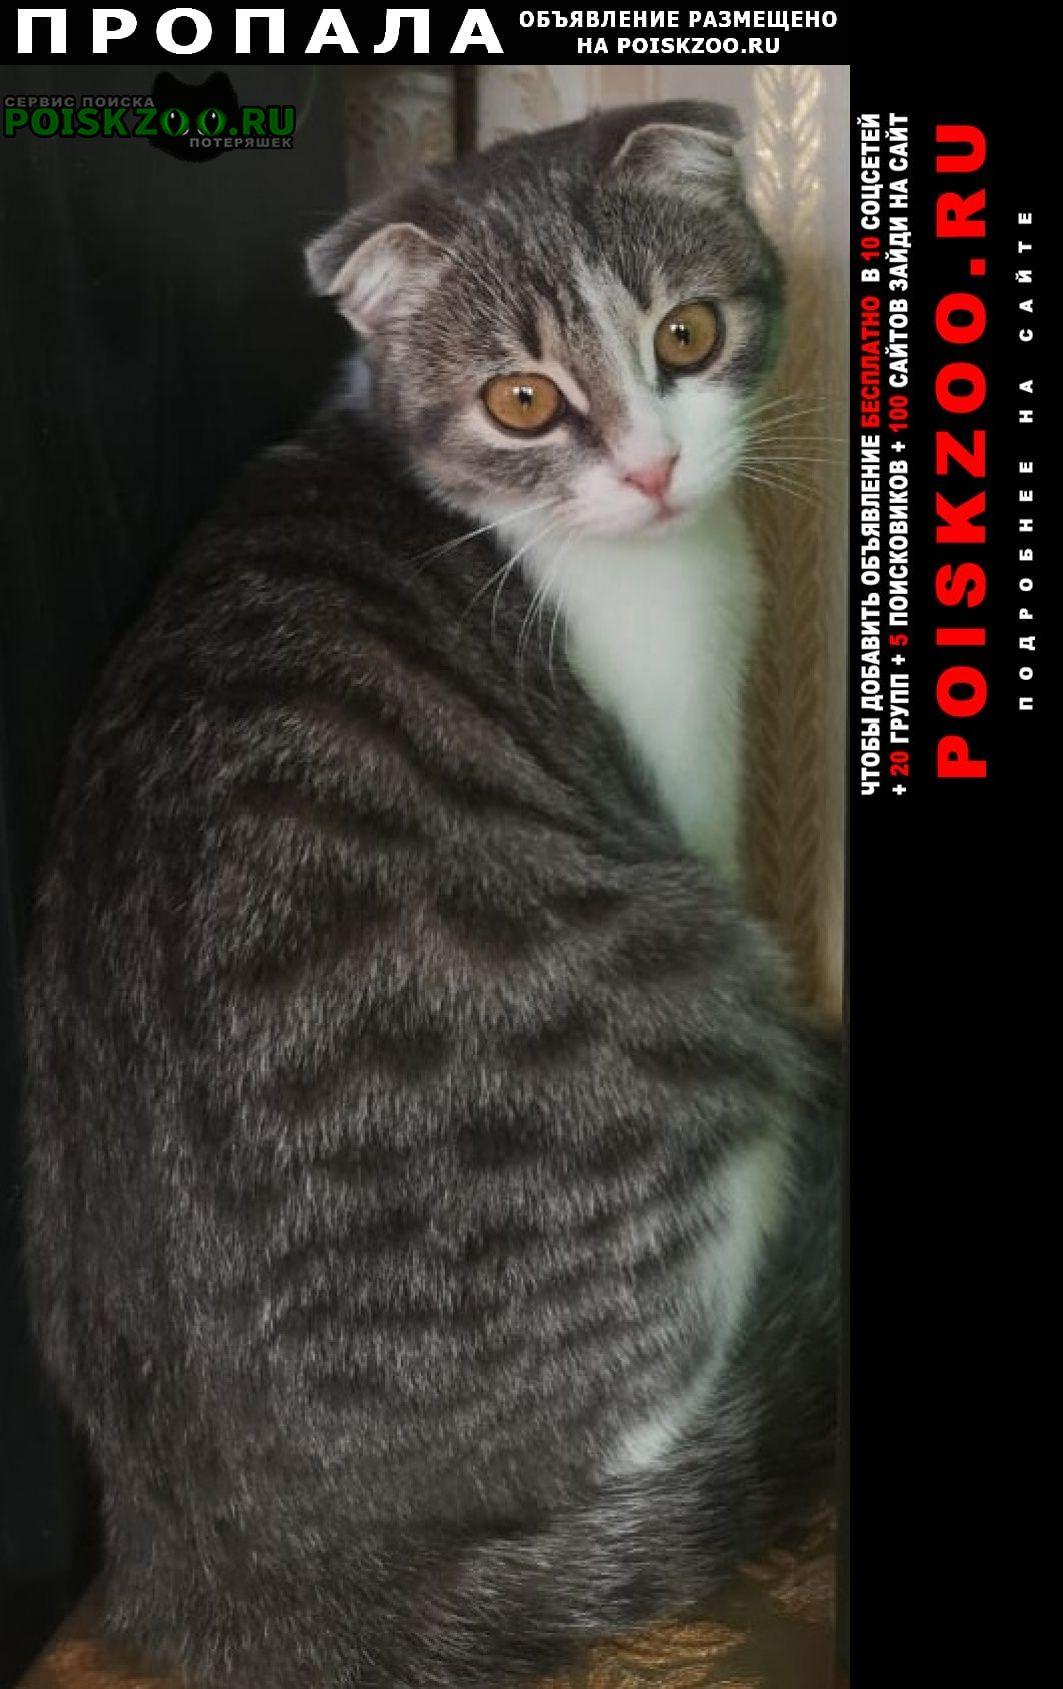 Пропала кошка метис вислоухой, 6 месяцев Краснодар